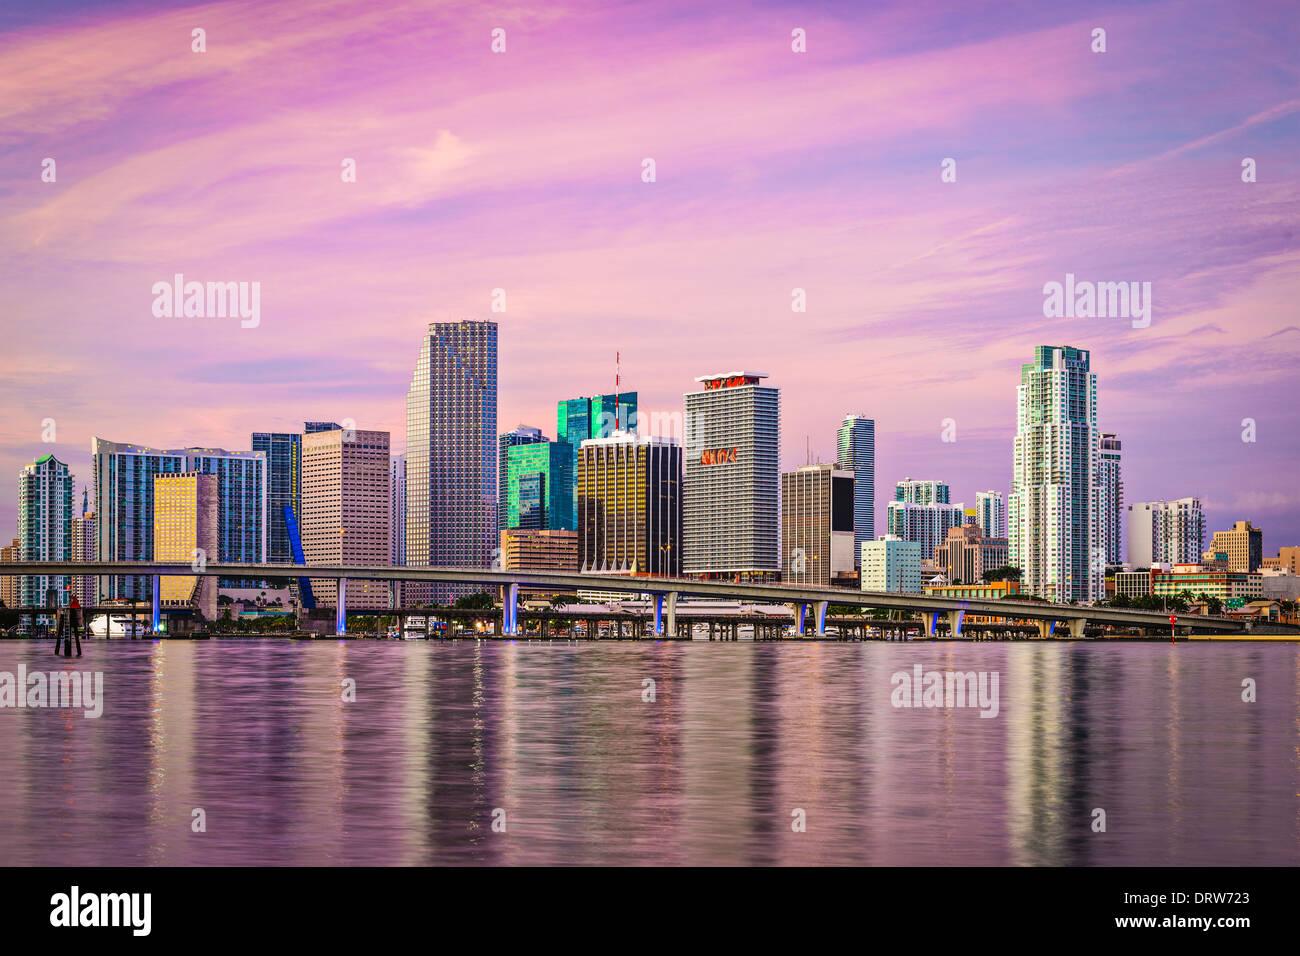 Miami, Florida skyline at Biscayne Bay. - Stock Image